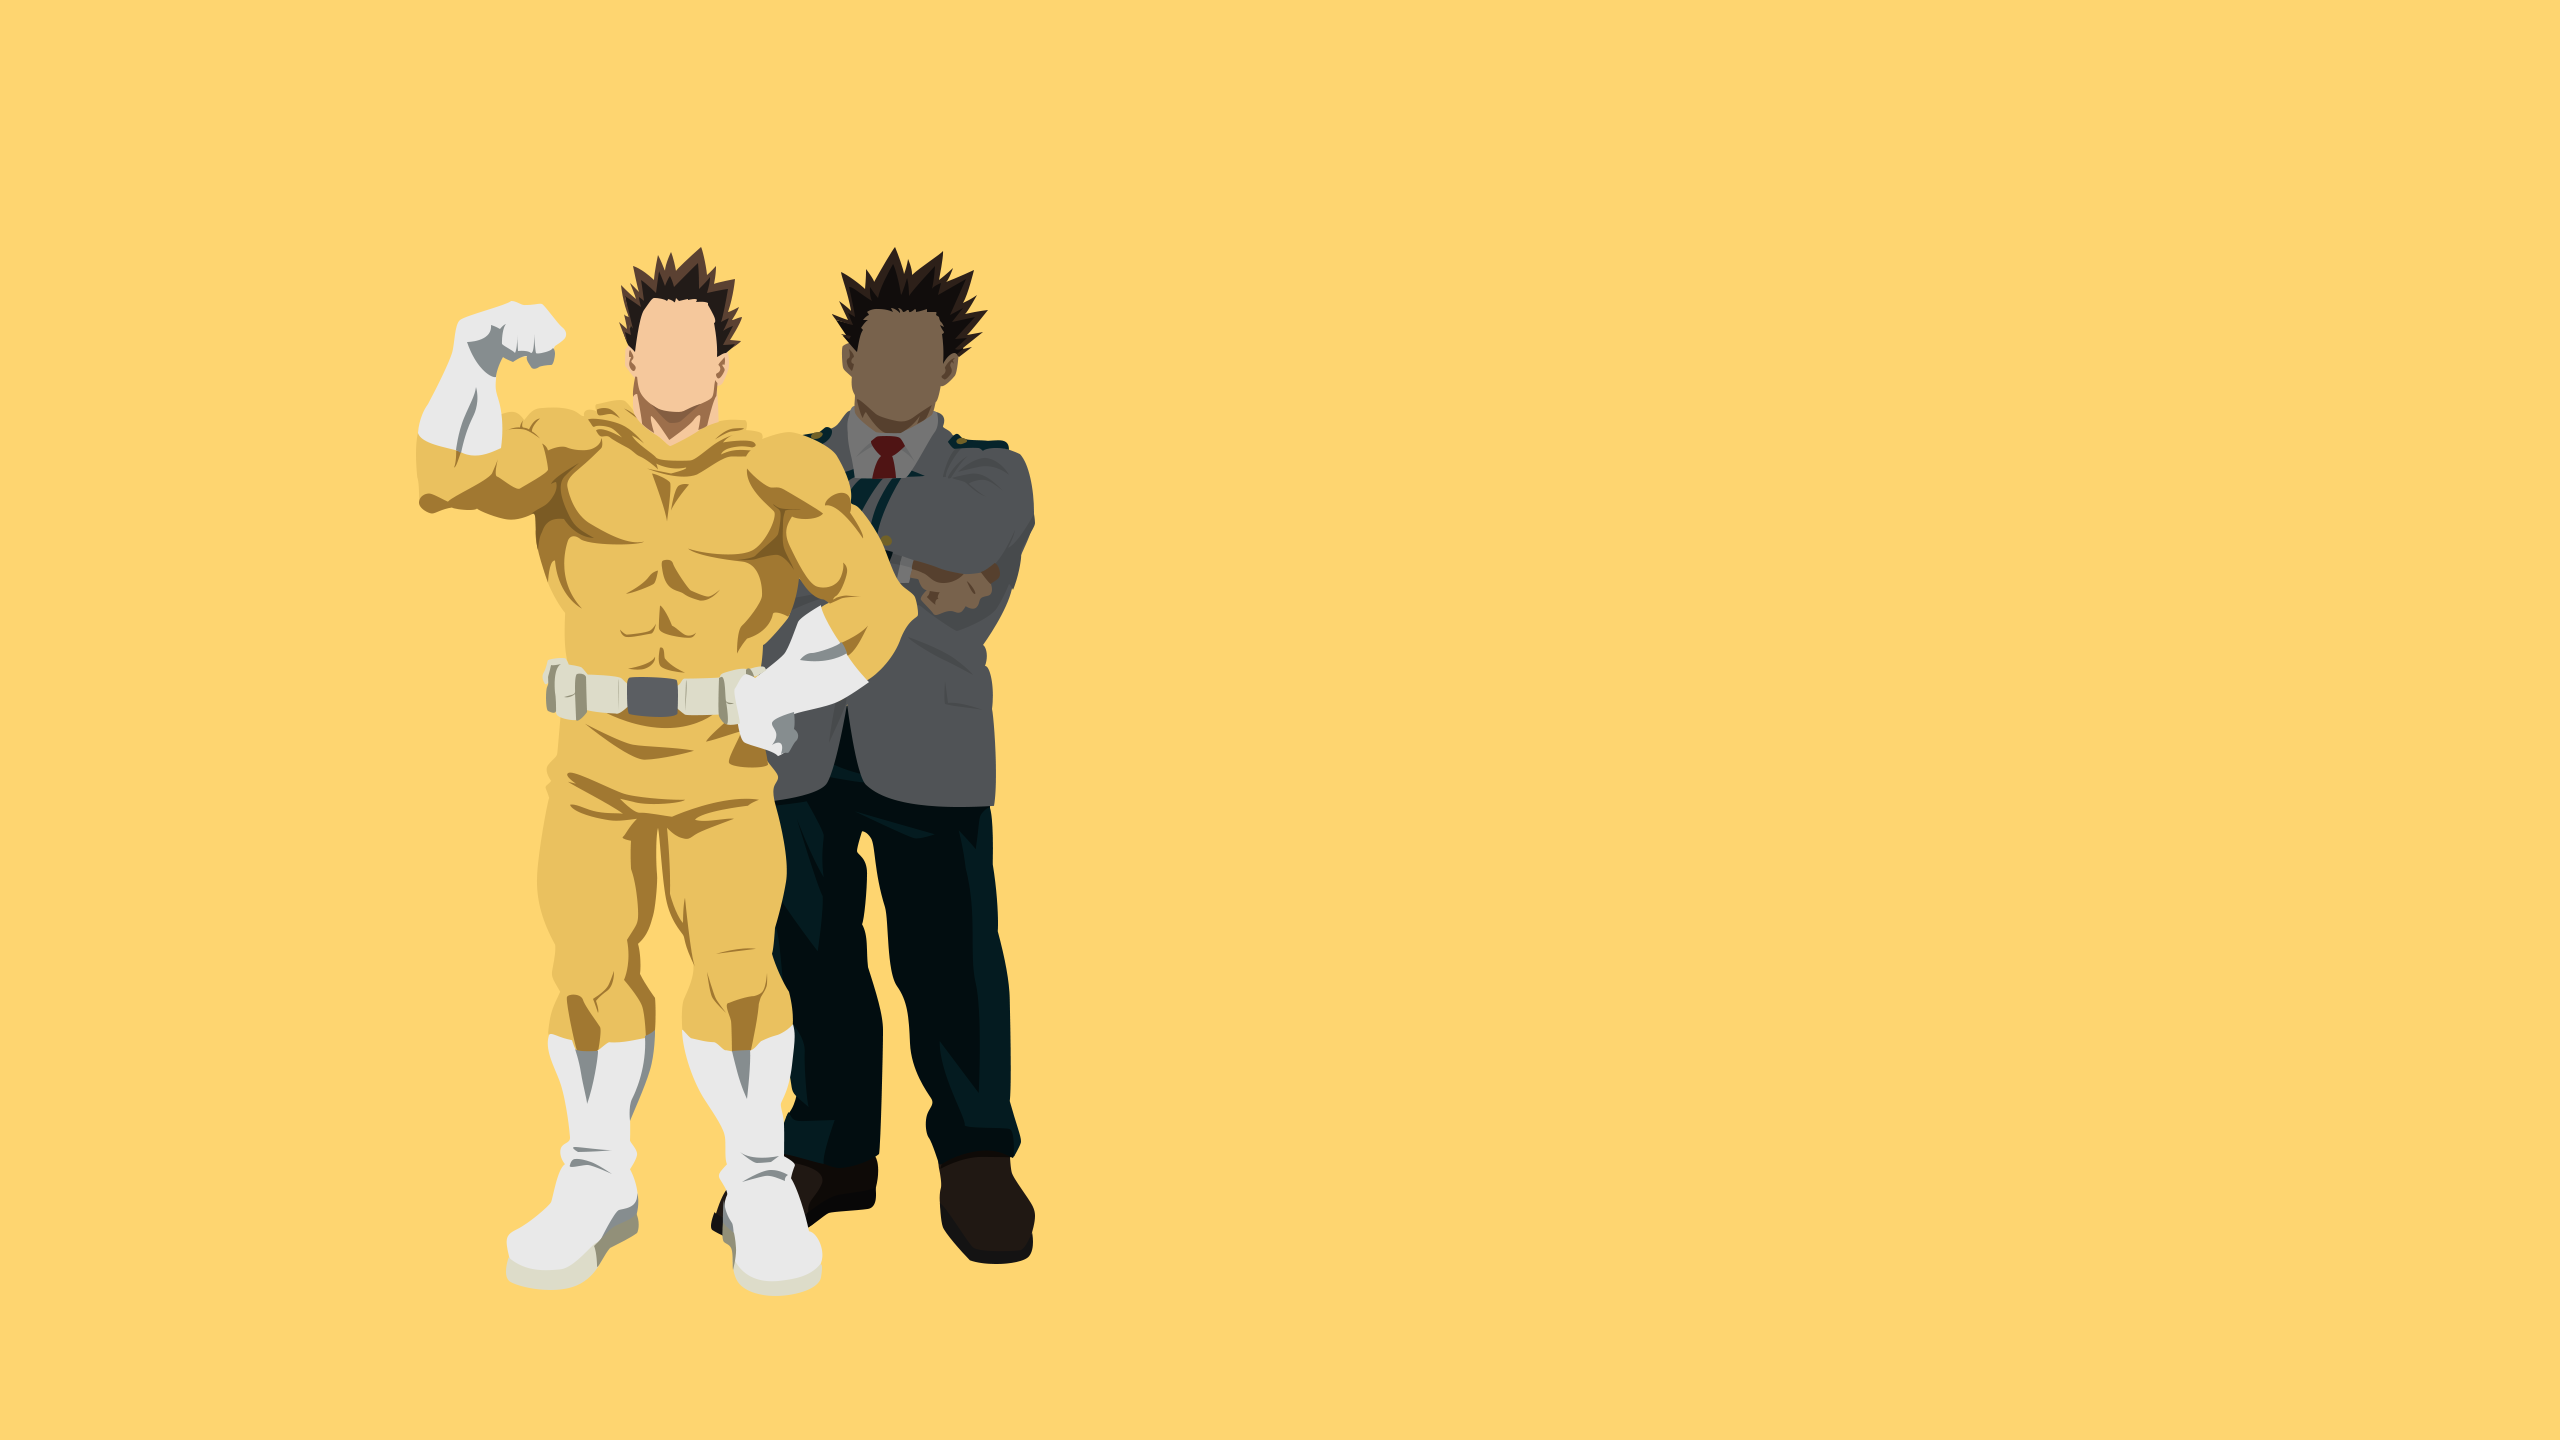 My Hero Academia Hd Wallpaper Background Image 2560x1440